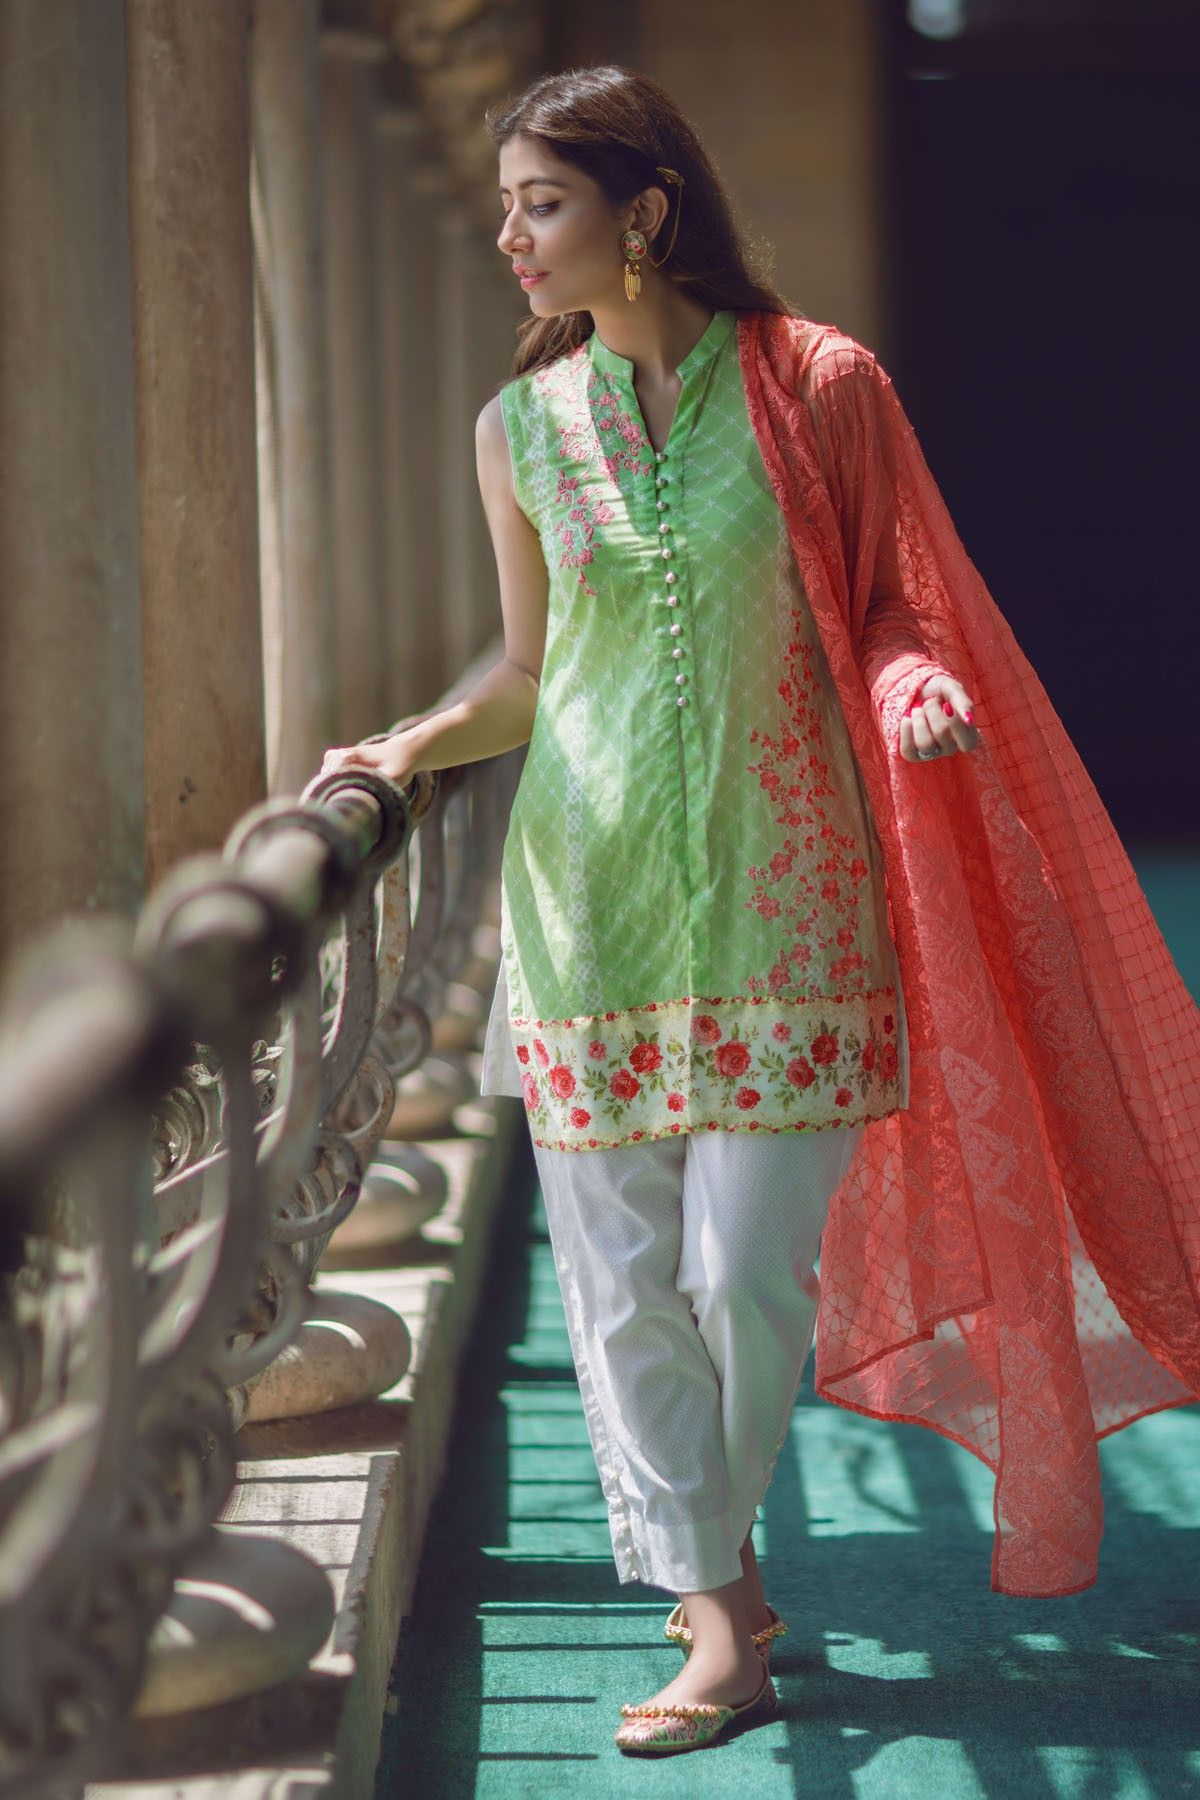 Latest Pakistani Fashion 2019-20: Medium Shirts With